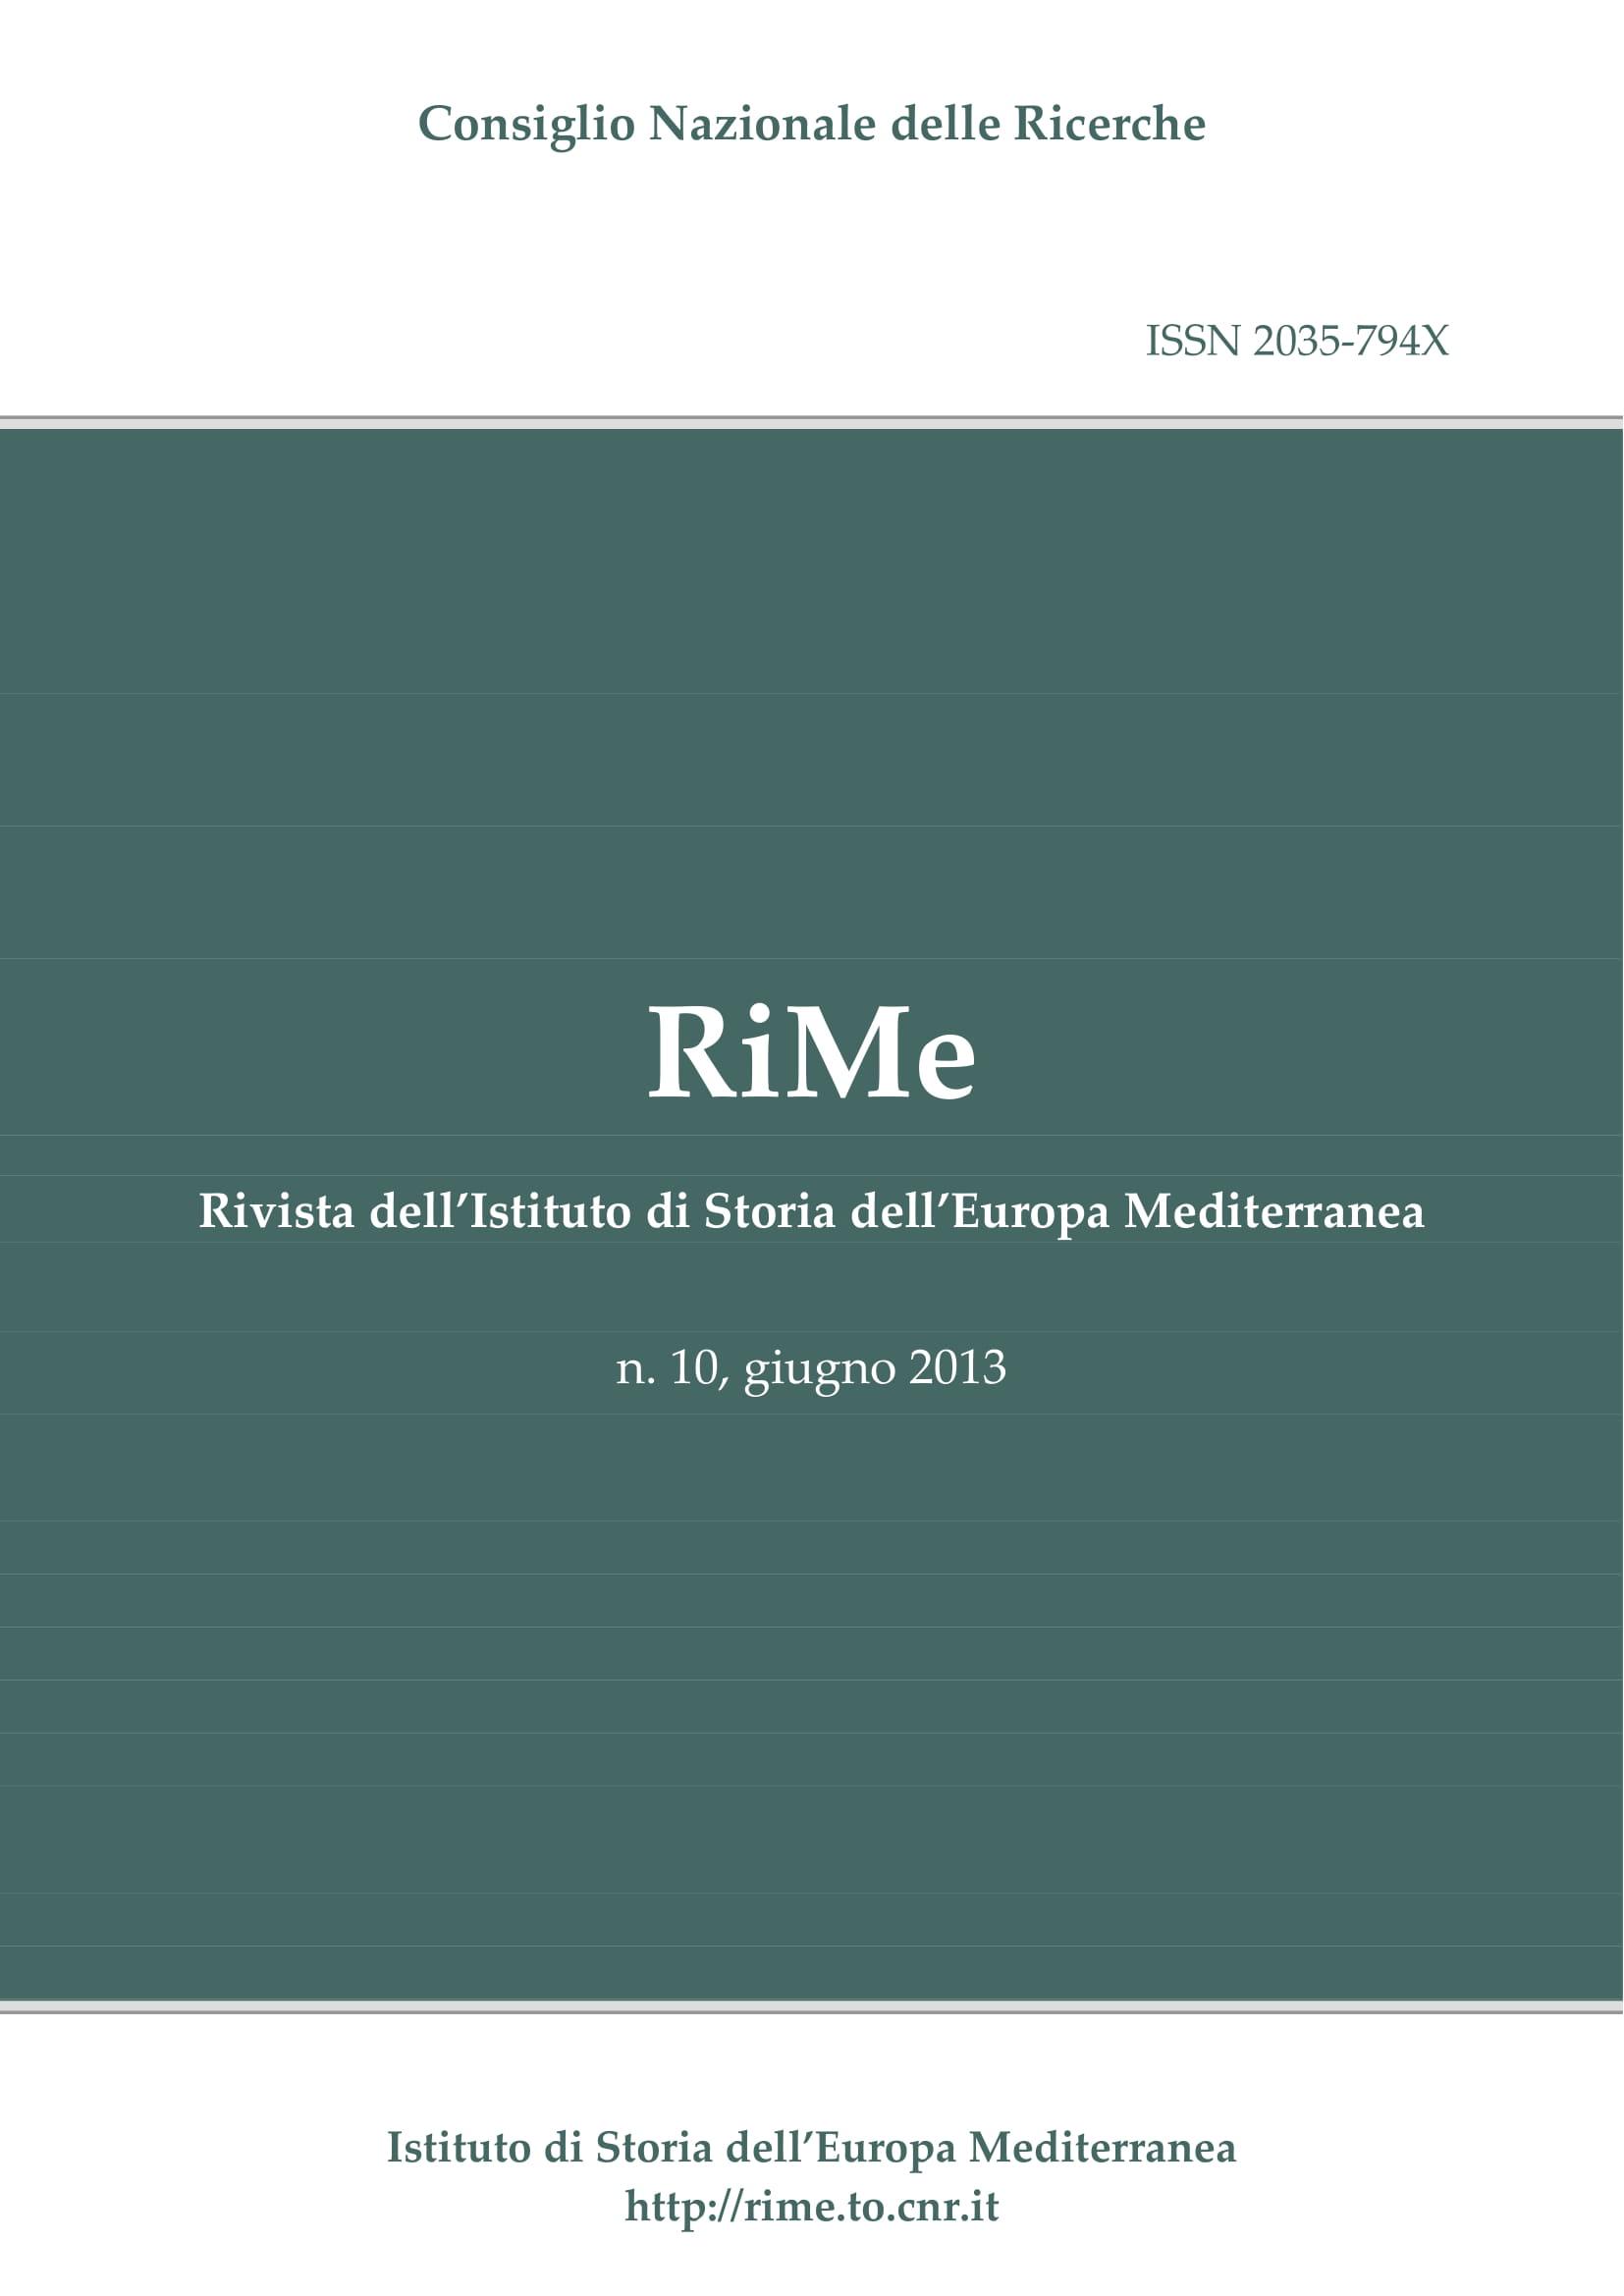 Vol. 10 (June 2013) cover